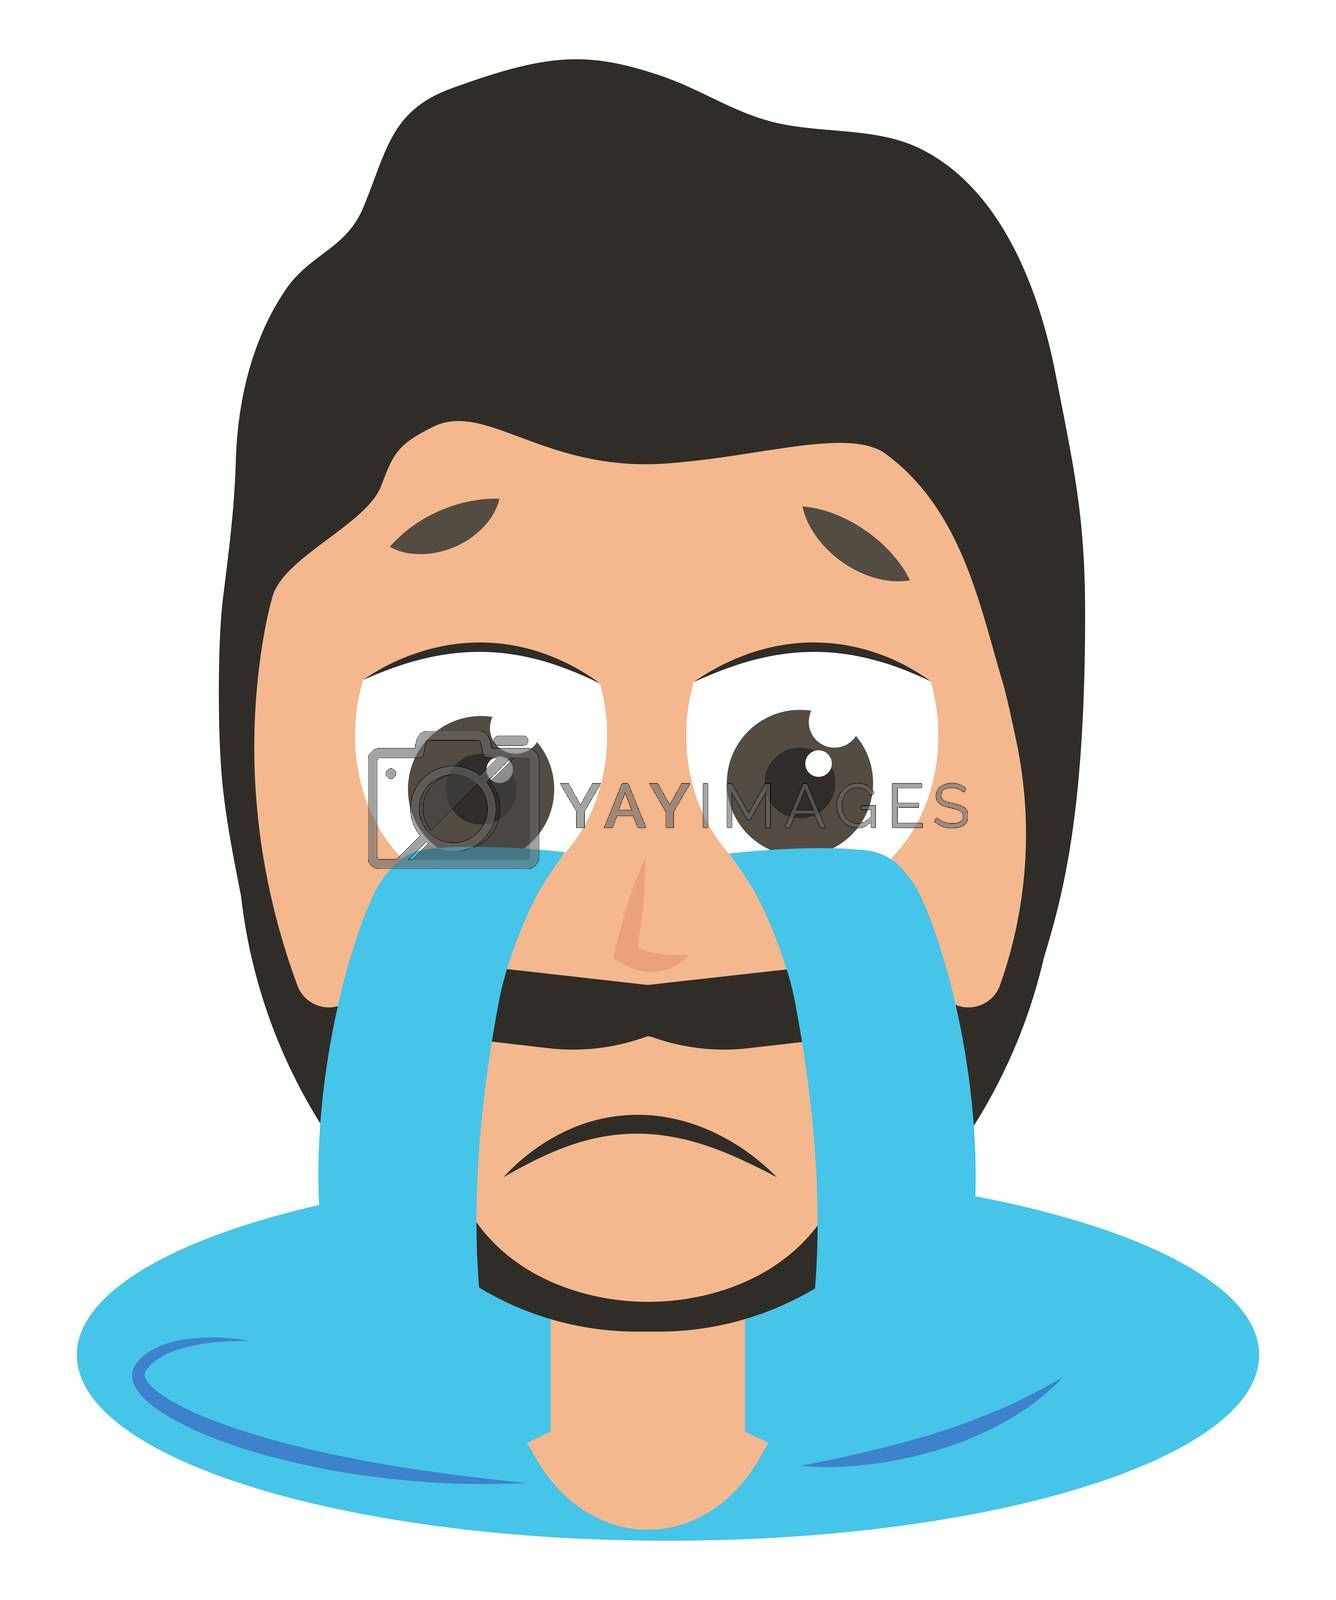 Man crying, illustration, vector on white background